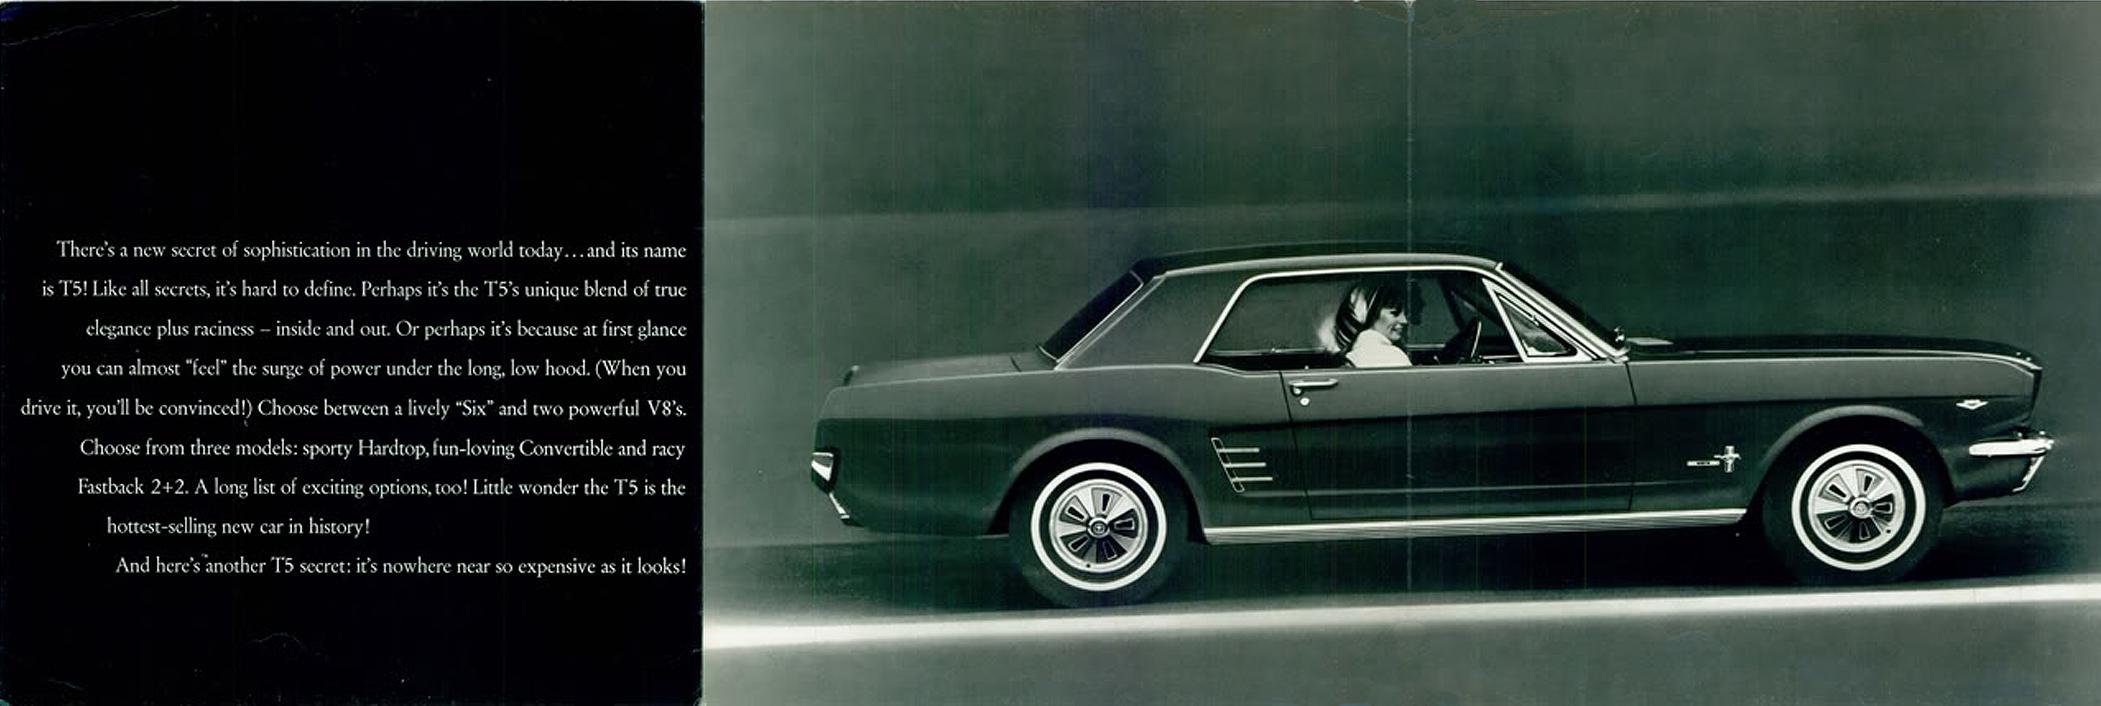 1966 Ford Mustang T5 Prospekt Englisch - Seite 2